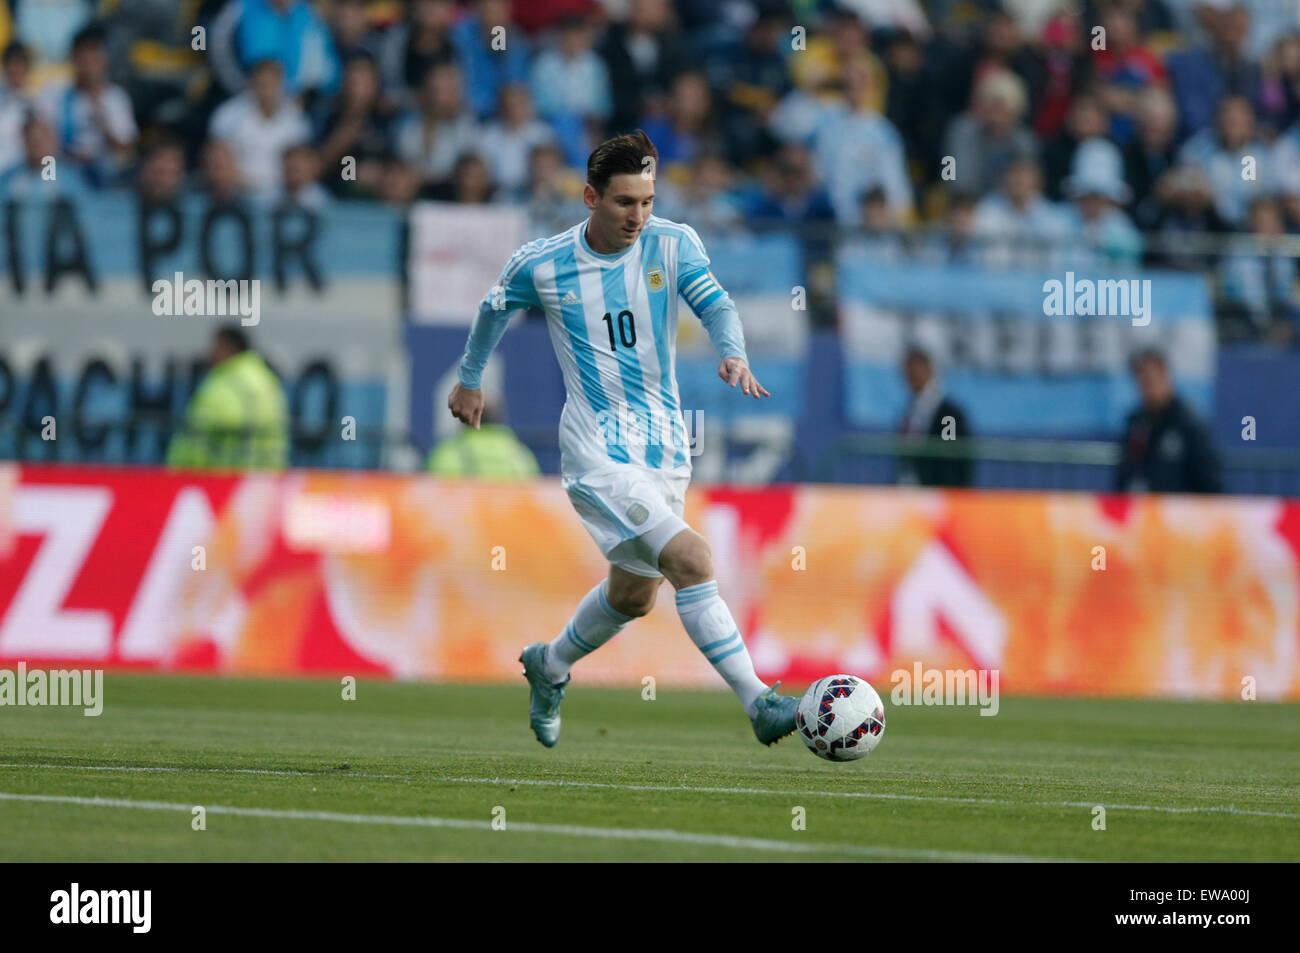 47b7947d3e0 Lionel Messi Argentina Stock Photos   Lionel Messi Argentina Stock ...